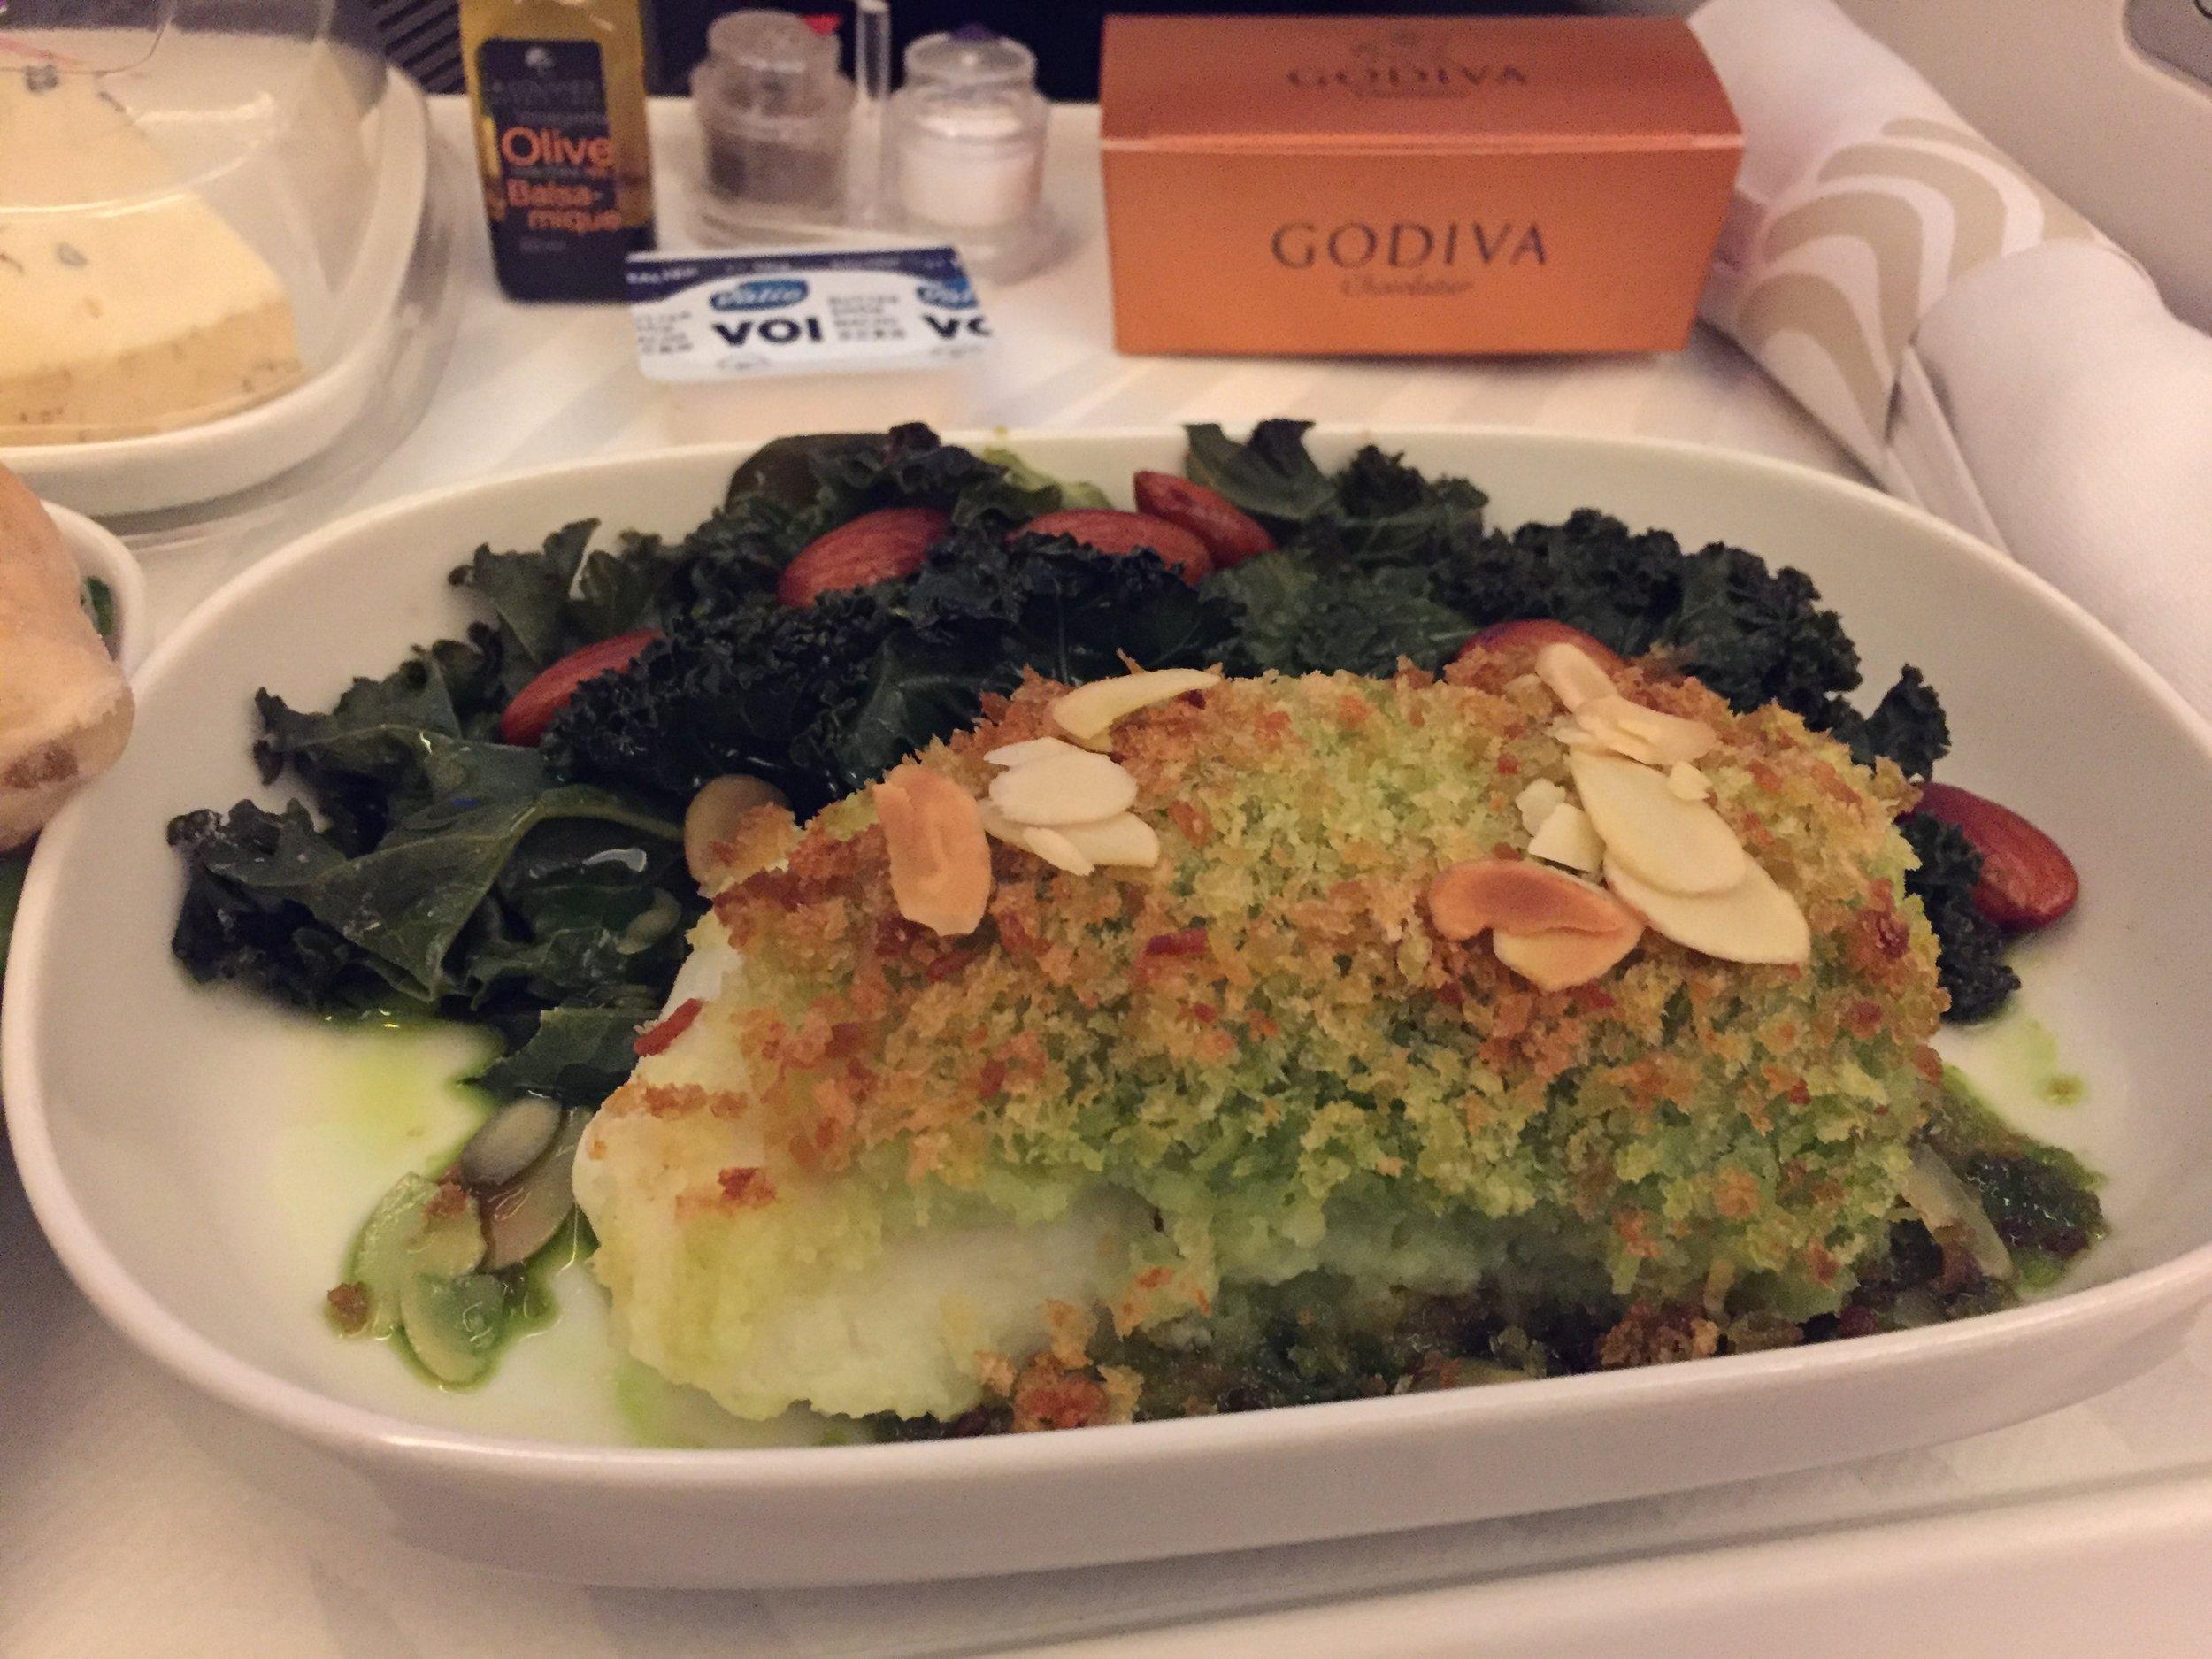 finnair biz class food.JPG